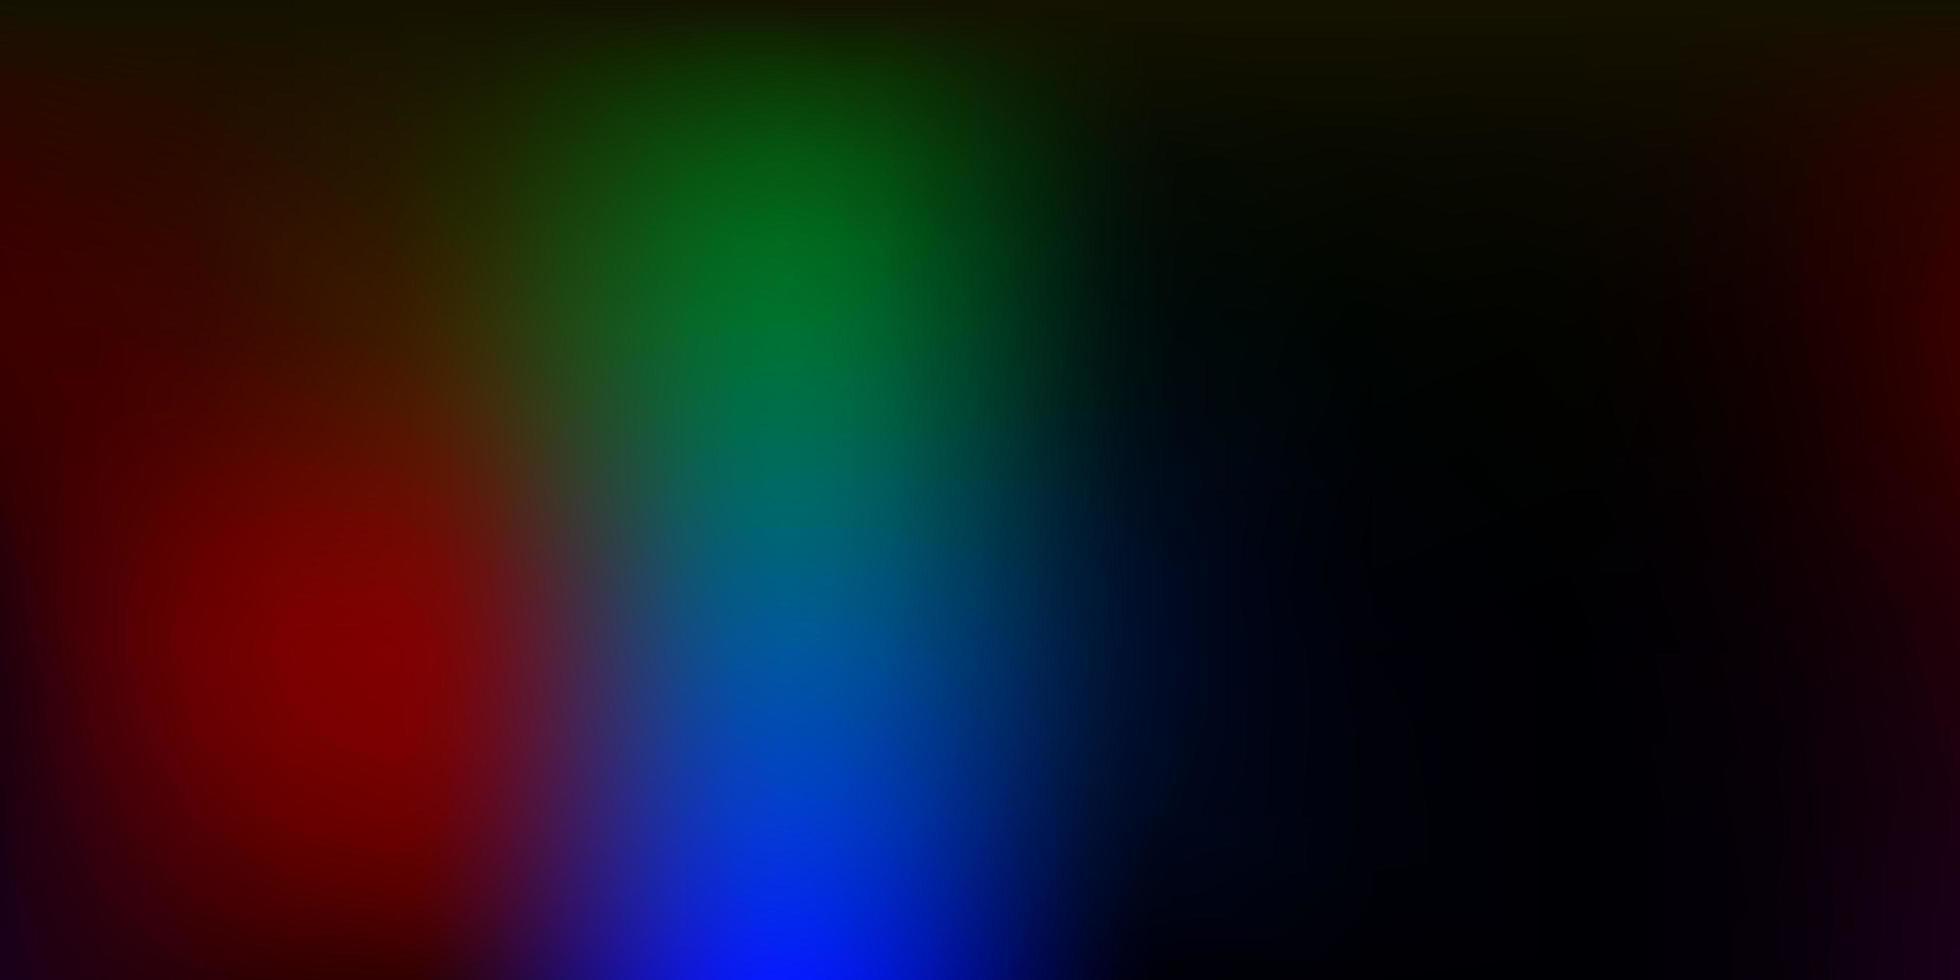 dunkles mehrfarbiges abstraktes Unschärfelayout. vektor